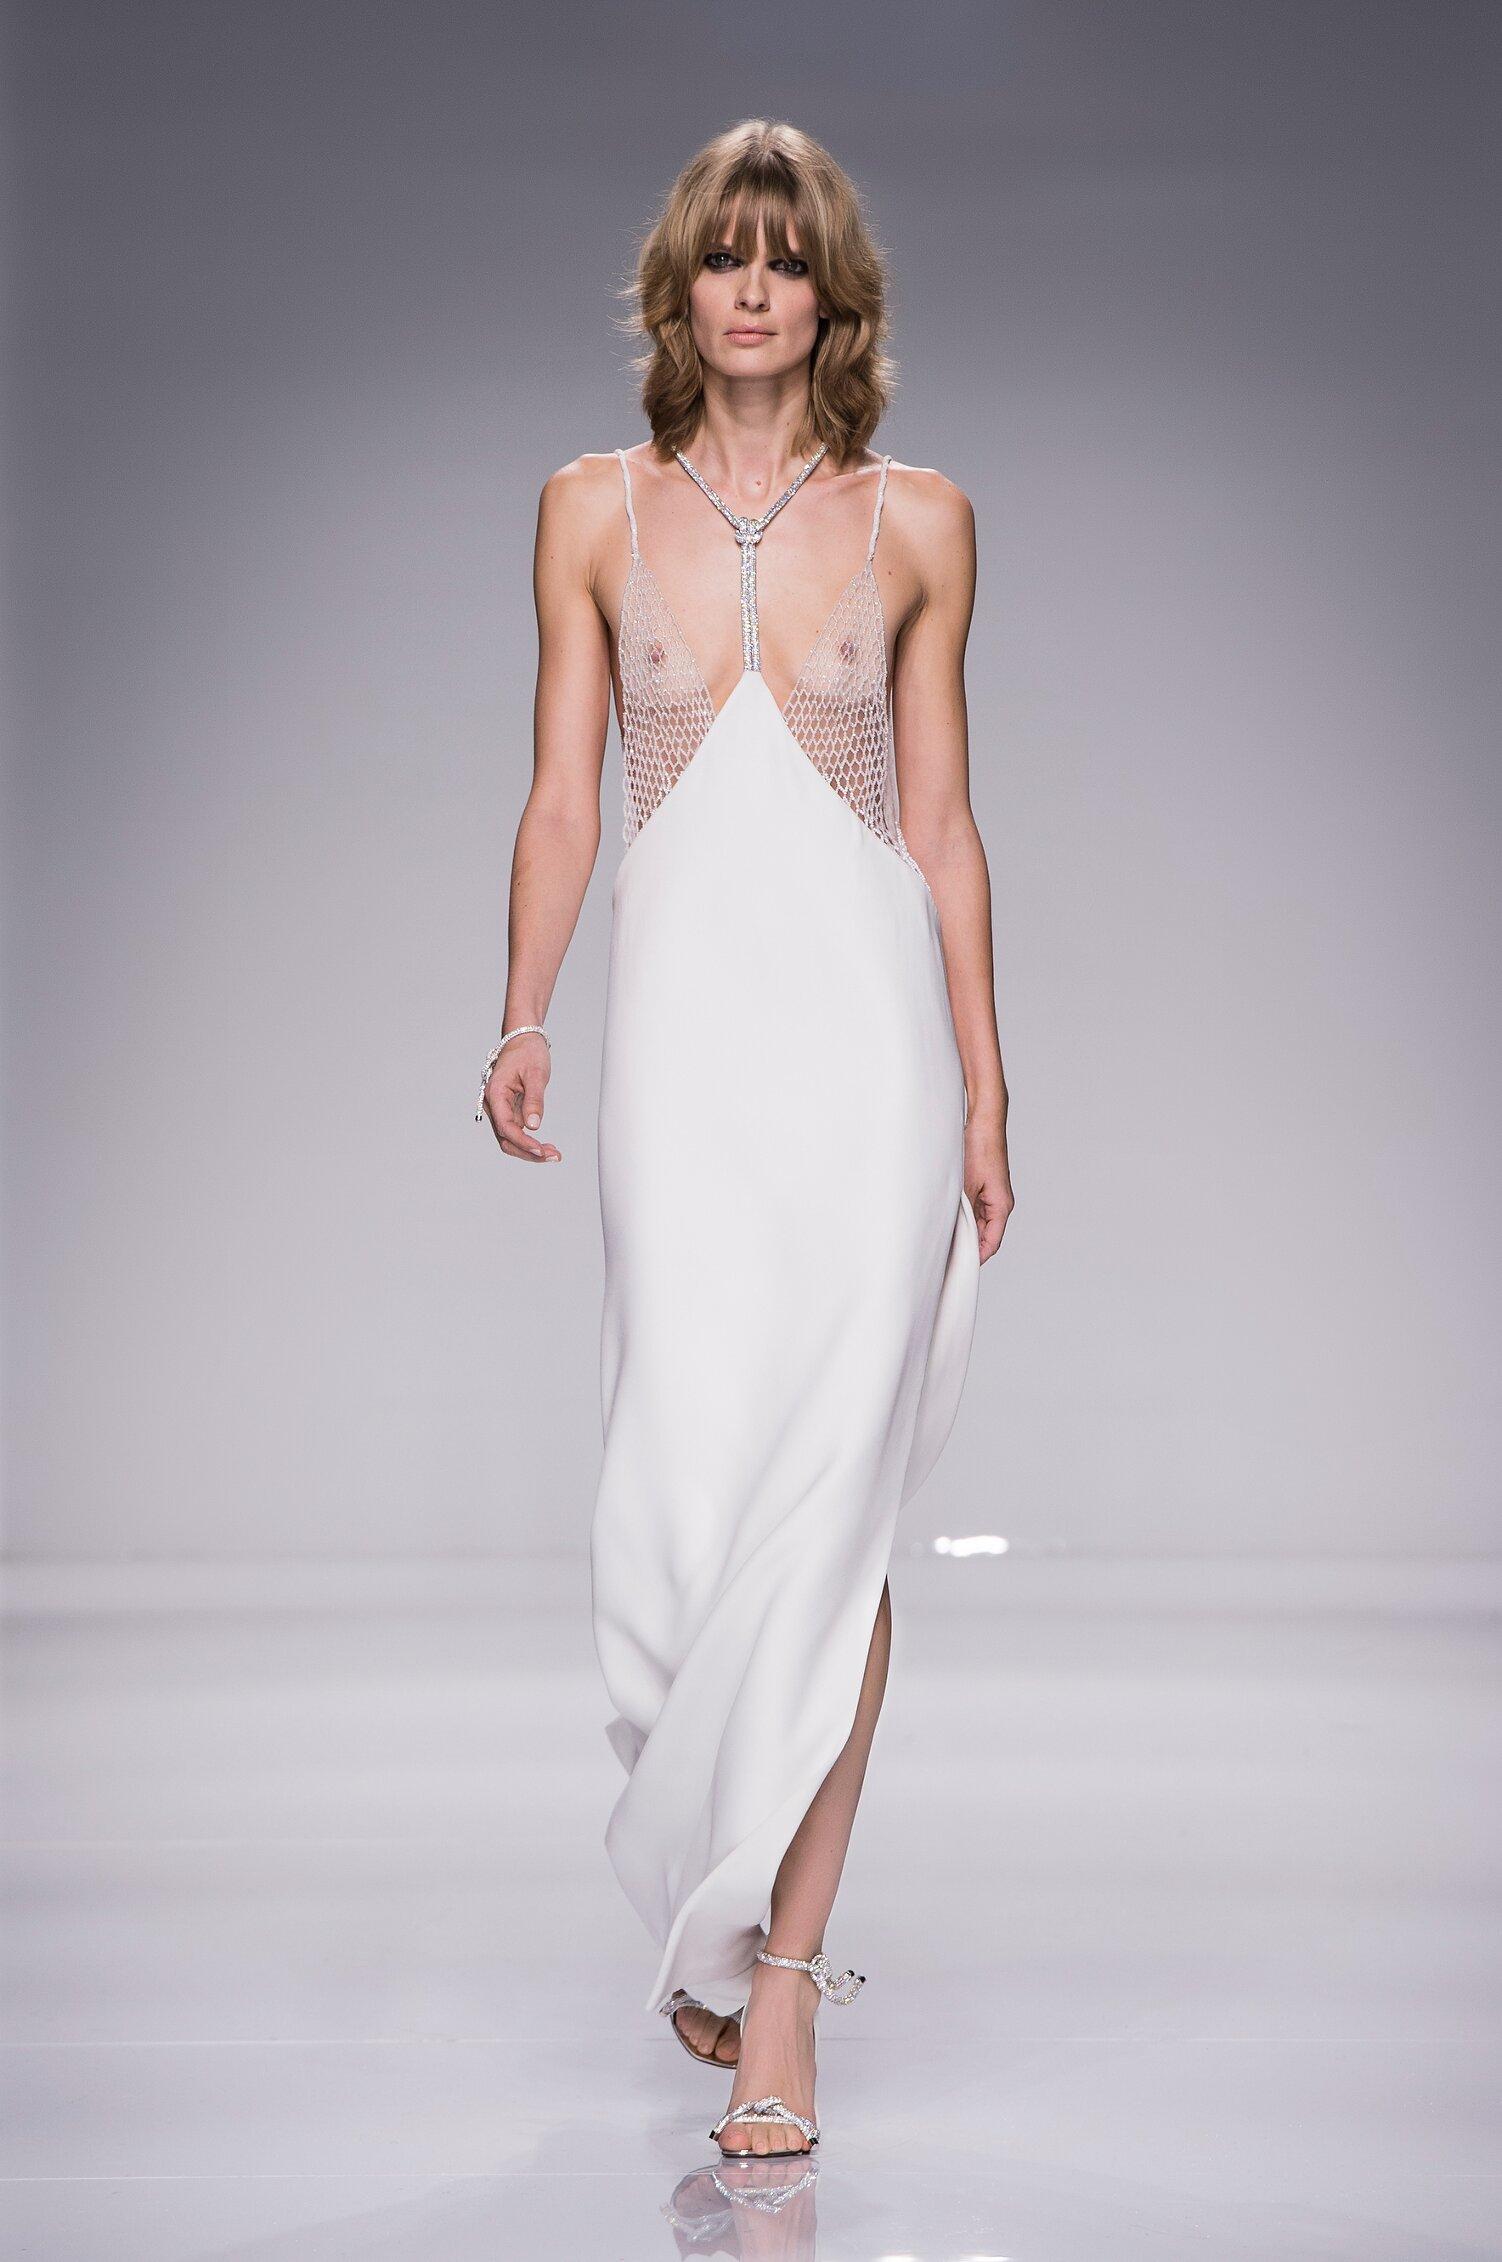 2016 Atelier Versace Couture Summer Catwalk